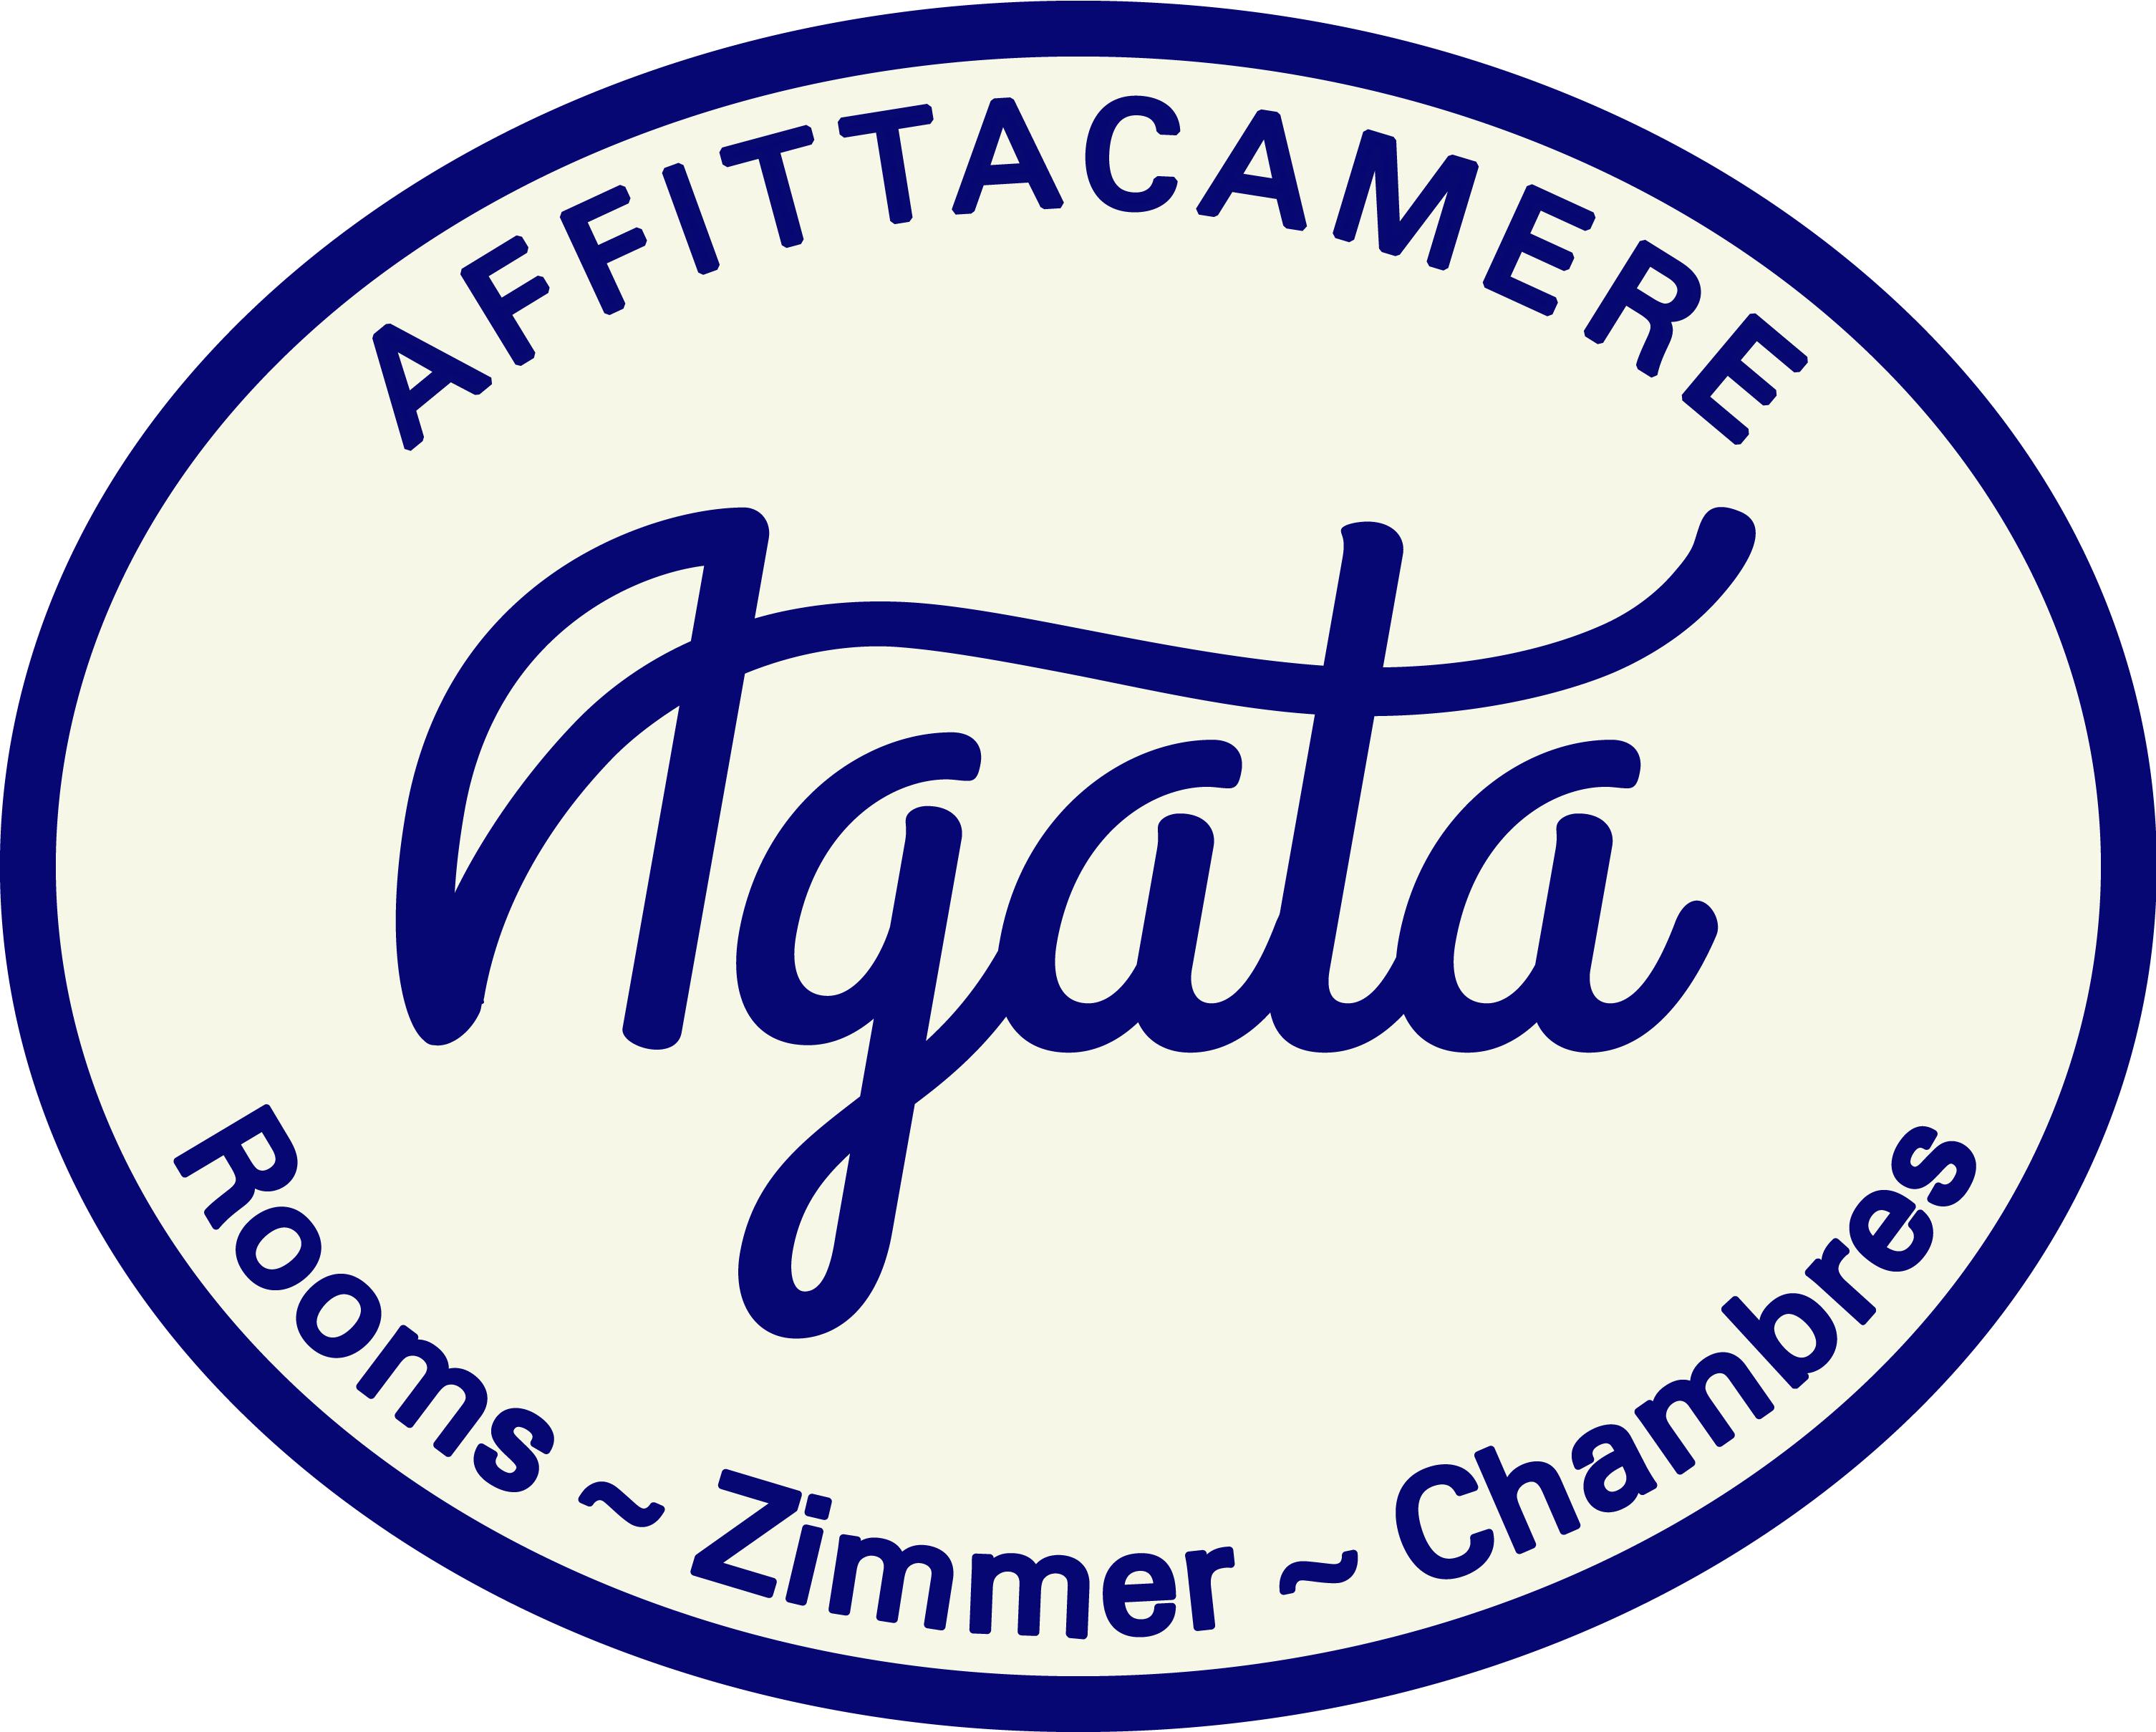 Affittacamere Agata